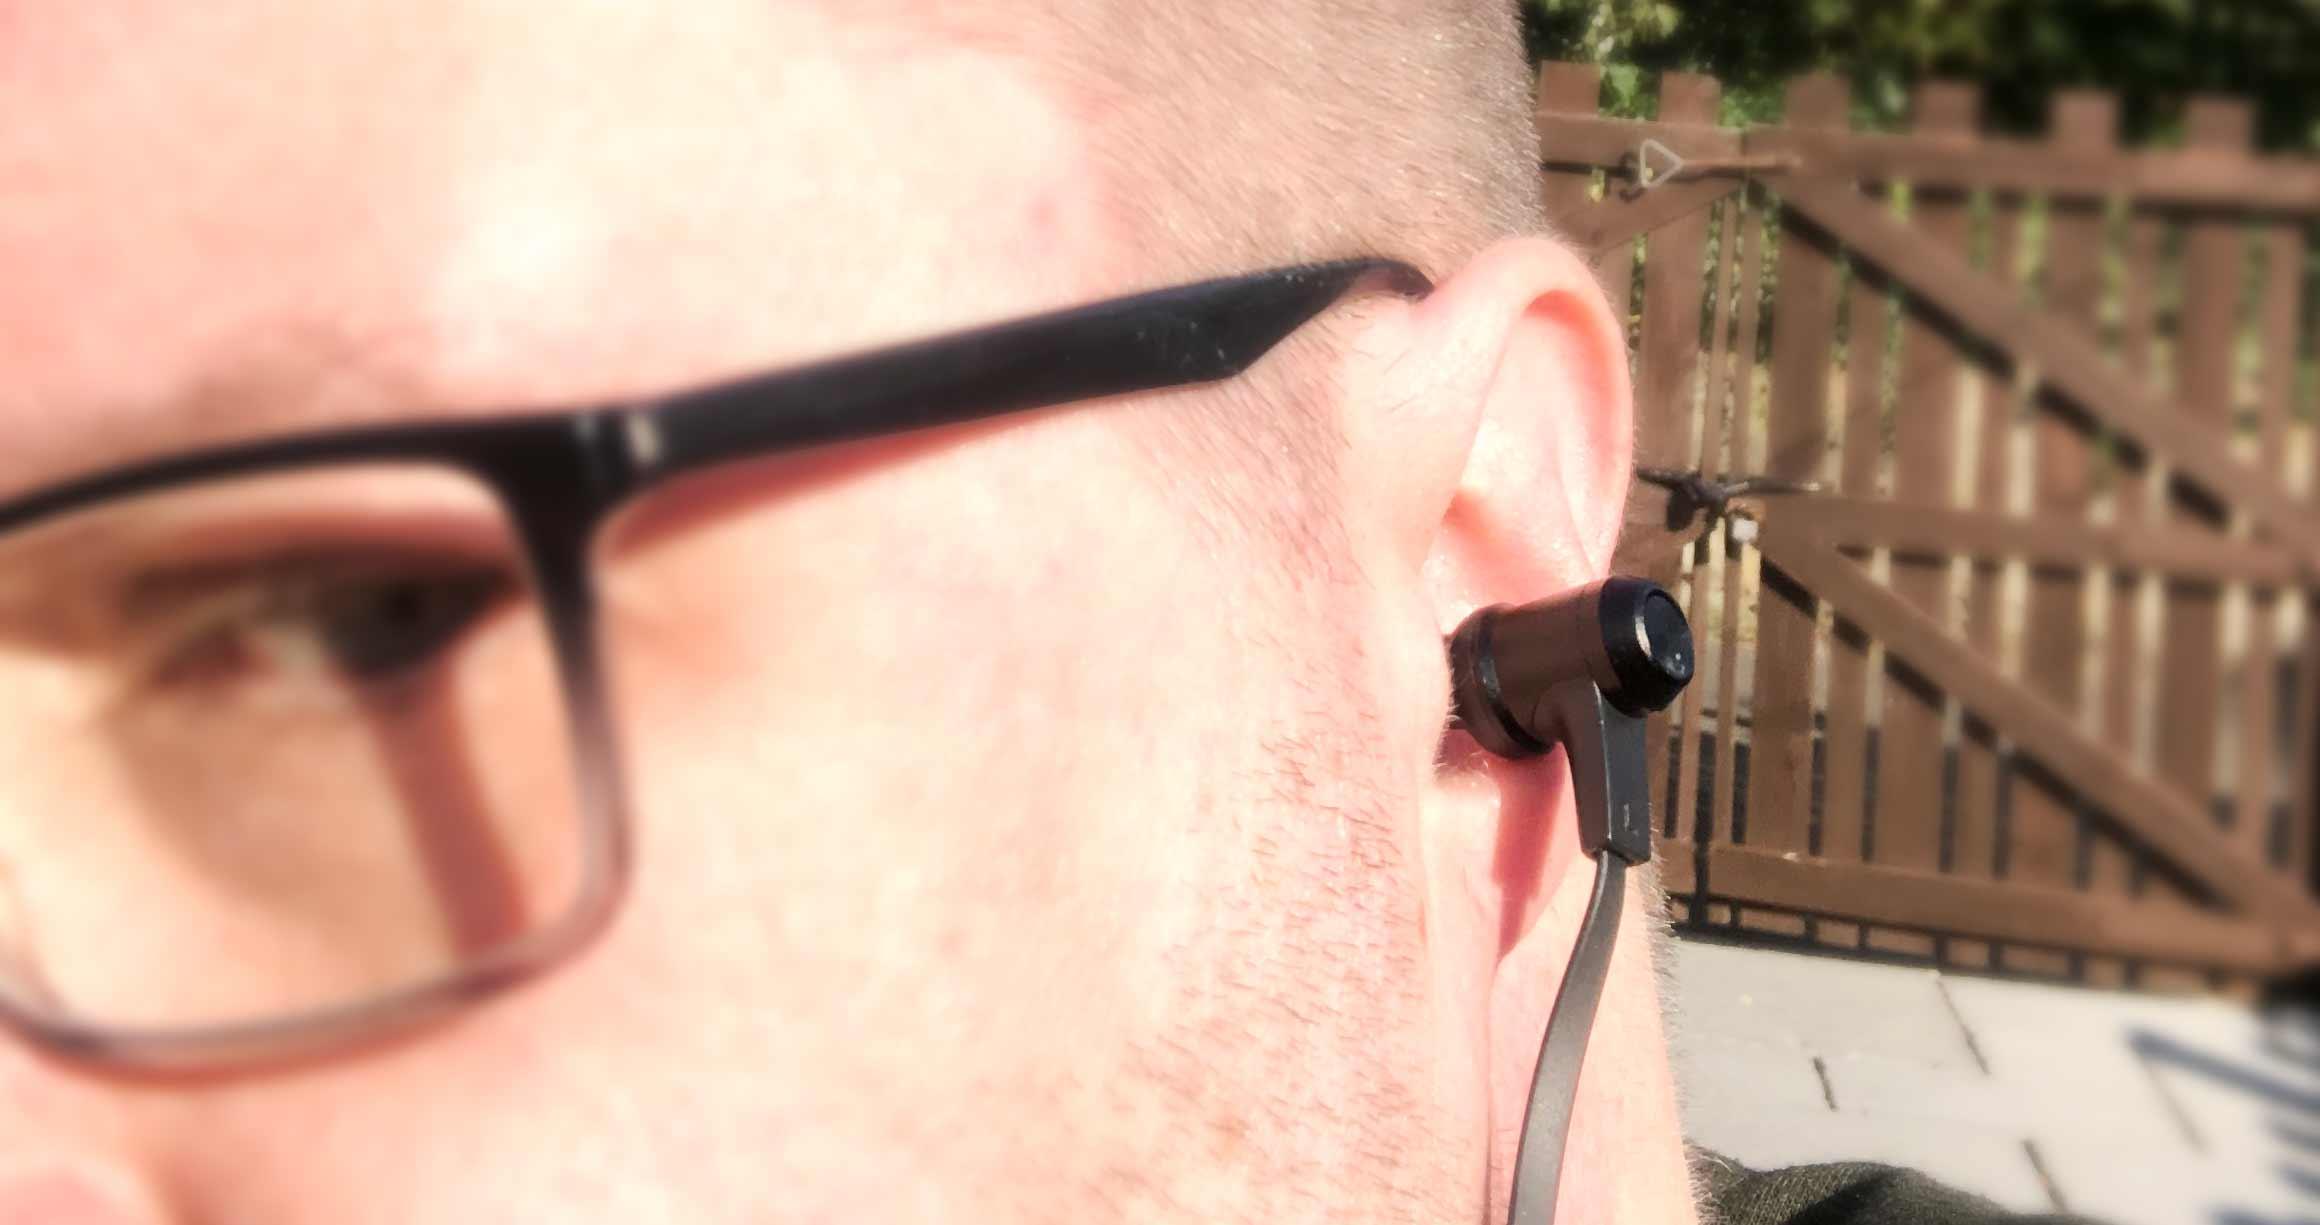 VAVA Moov 28 Earphones in ear fitting